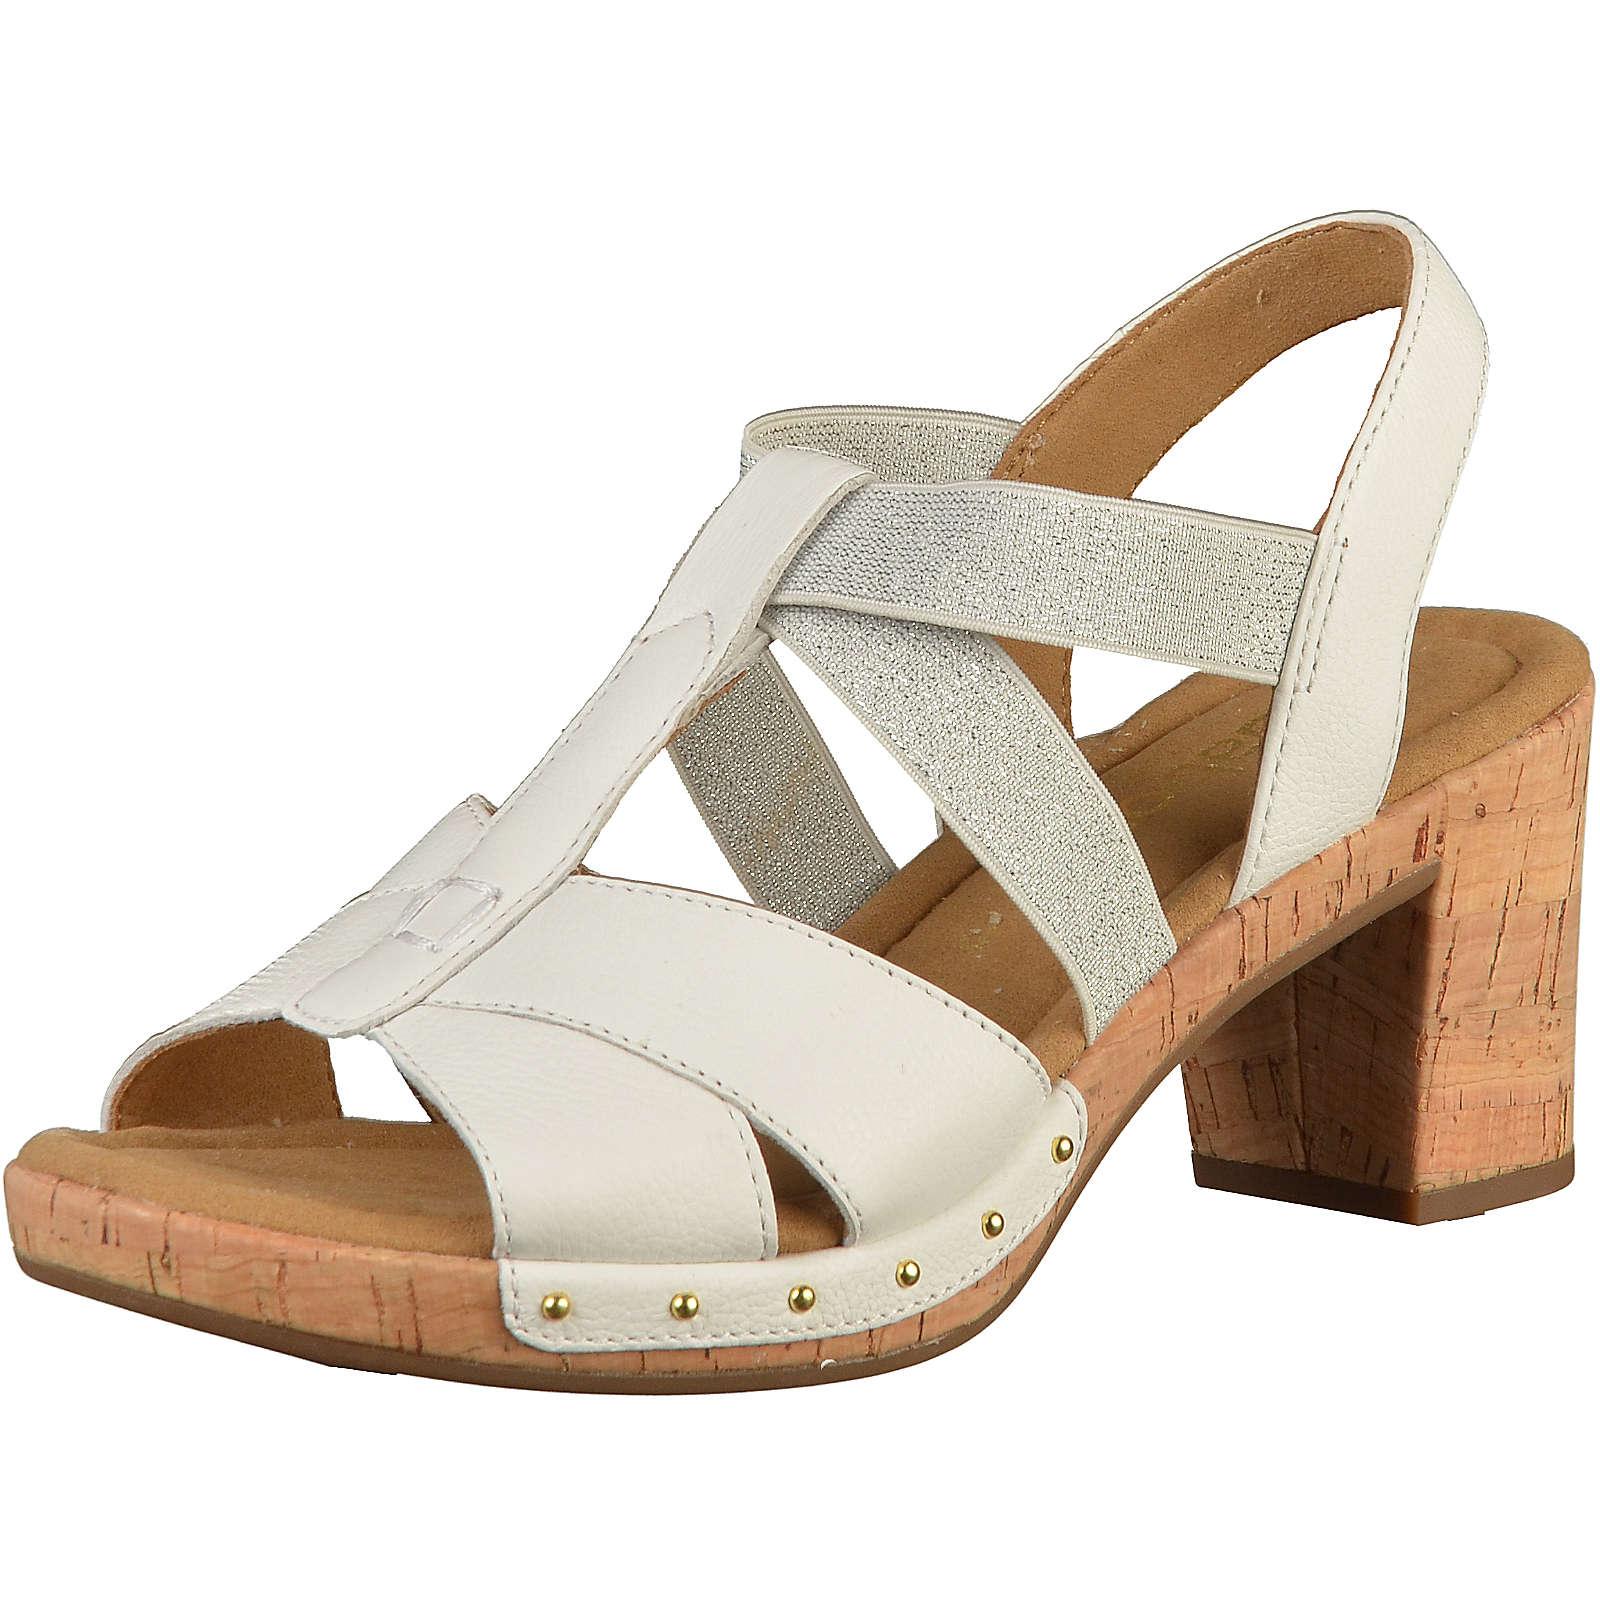 aa079532512a2 Rabatt-Preisvergleich.de - Damen > Schuhe > Sandalen